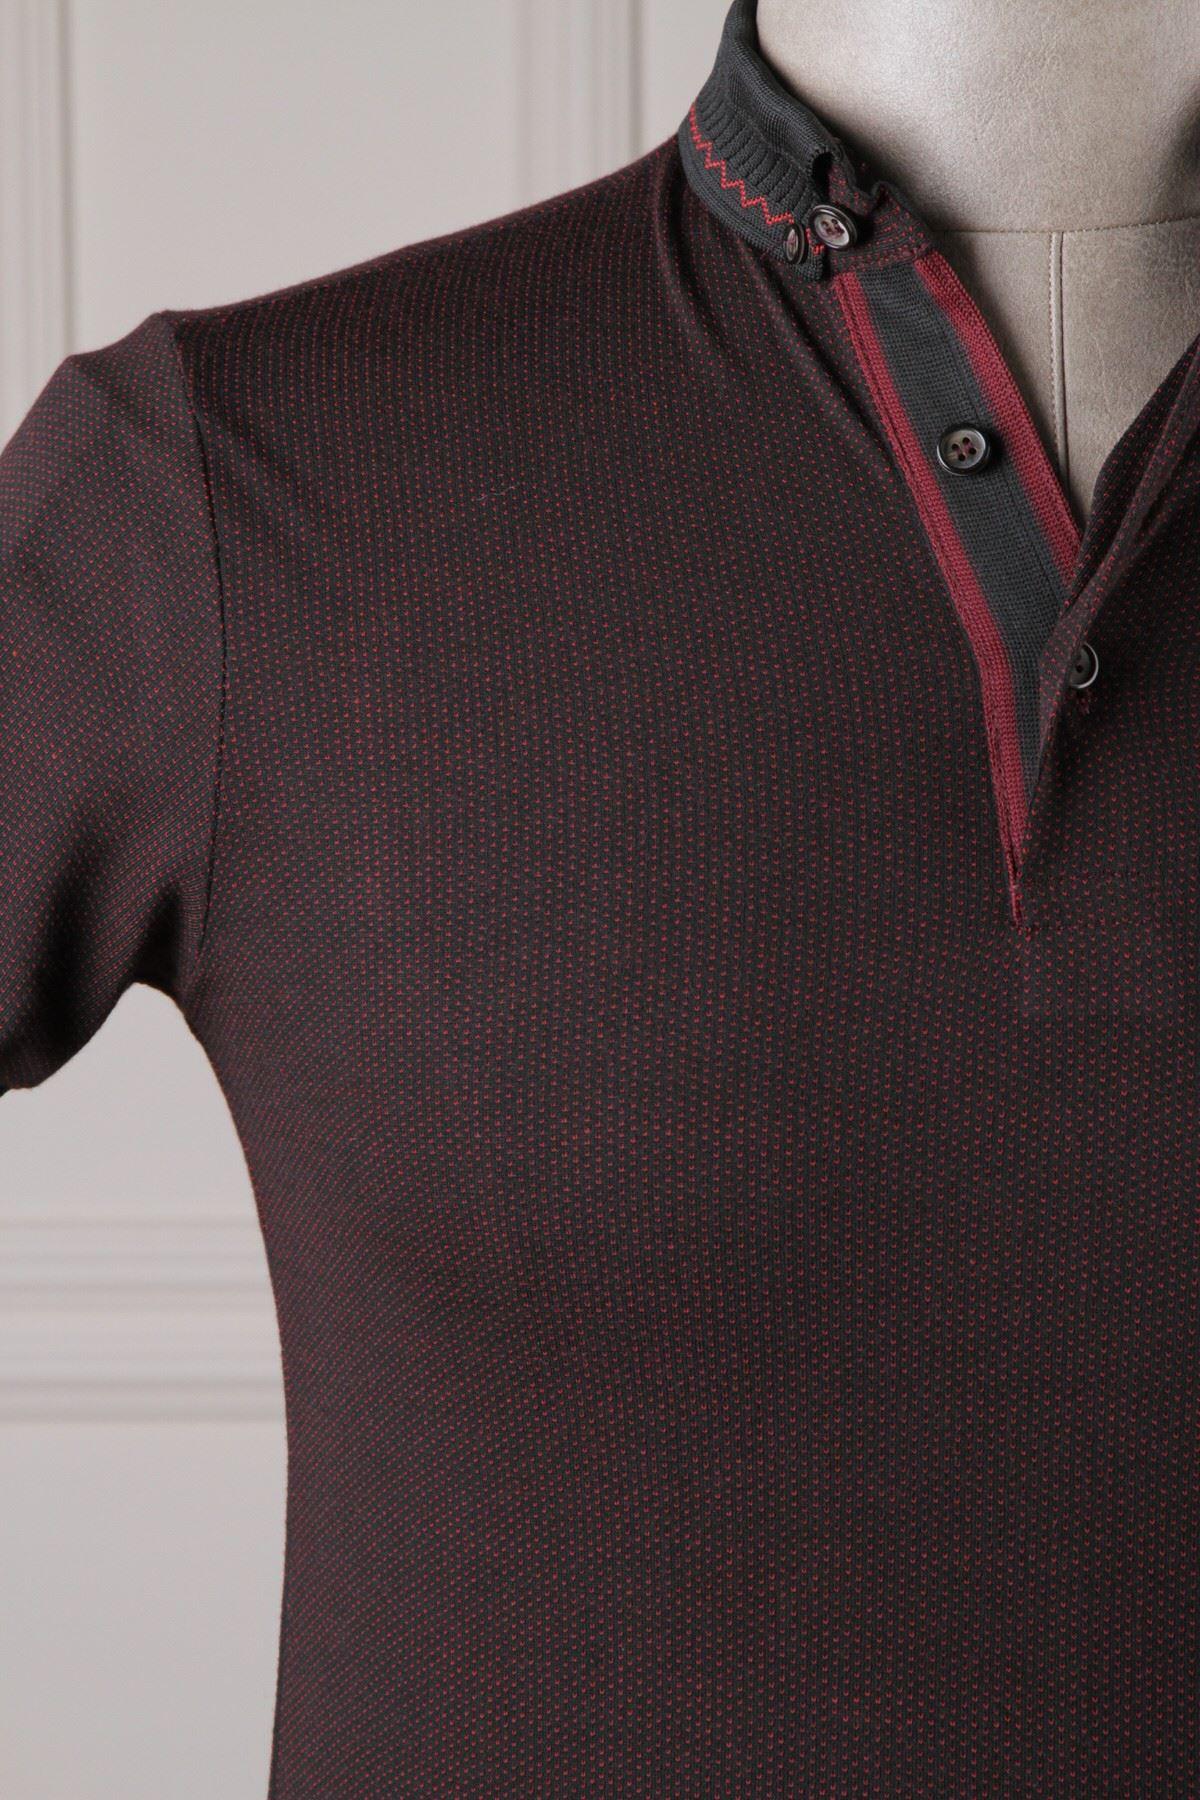 Erkek Nokta Desenli Polo Yaka T-Shirt - Bordo